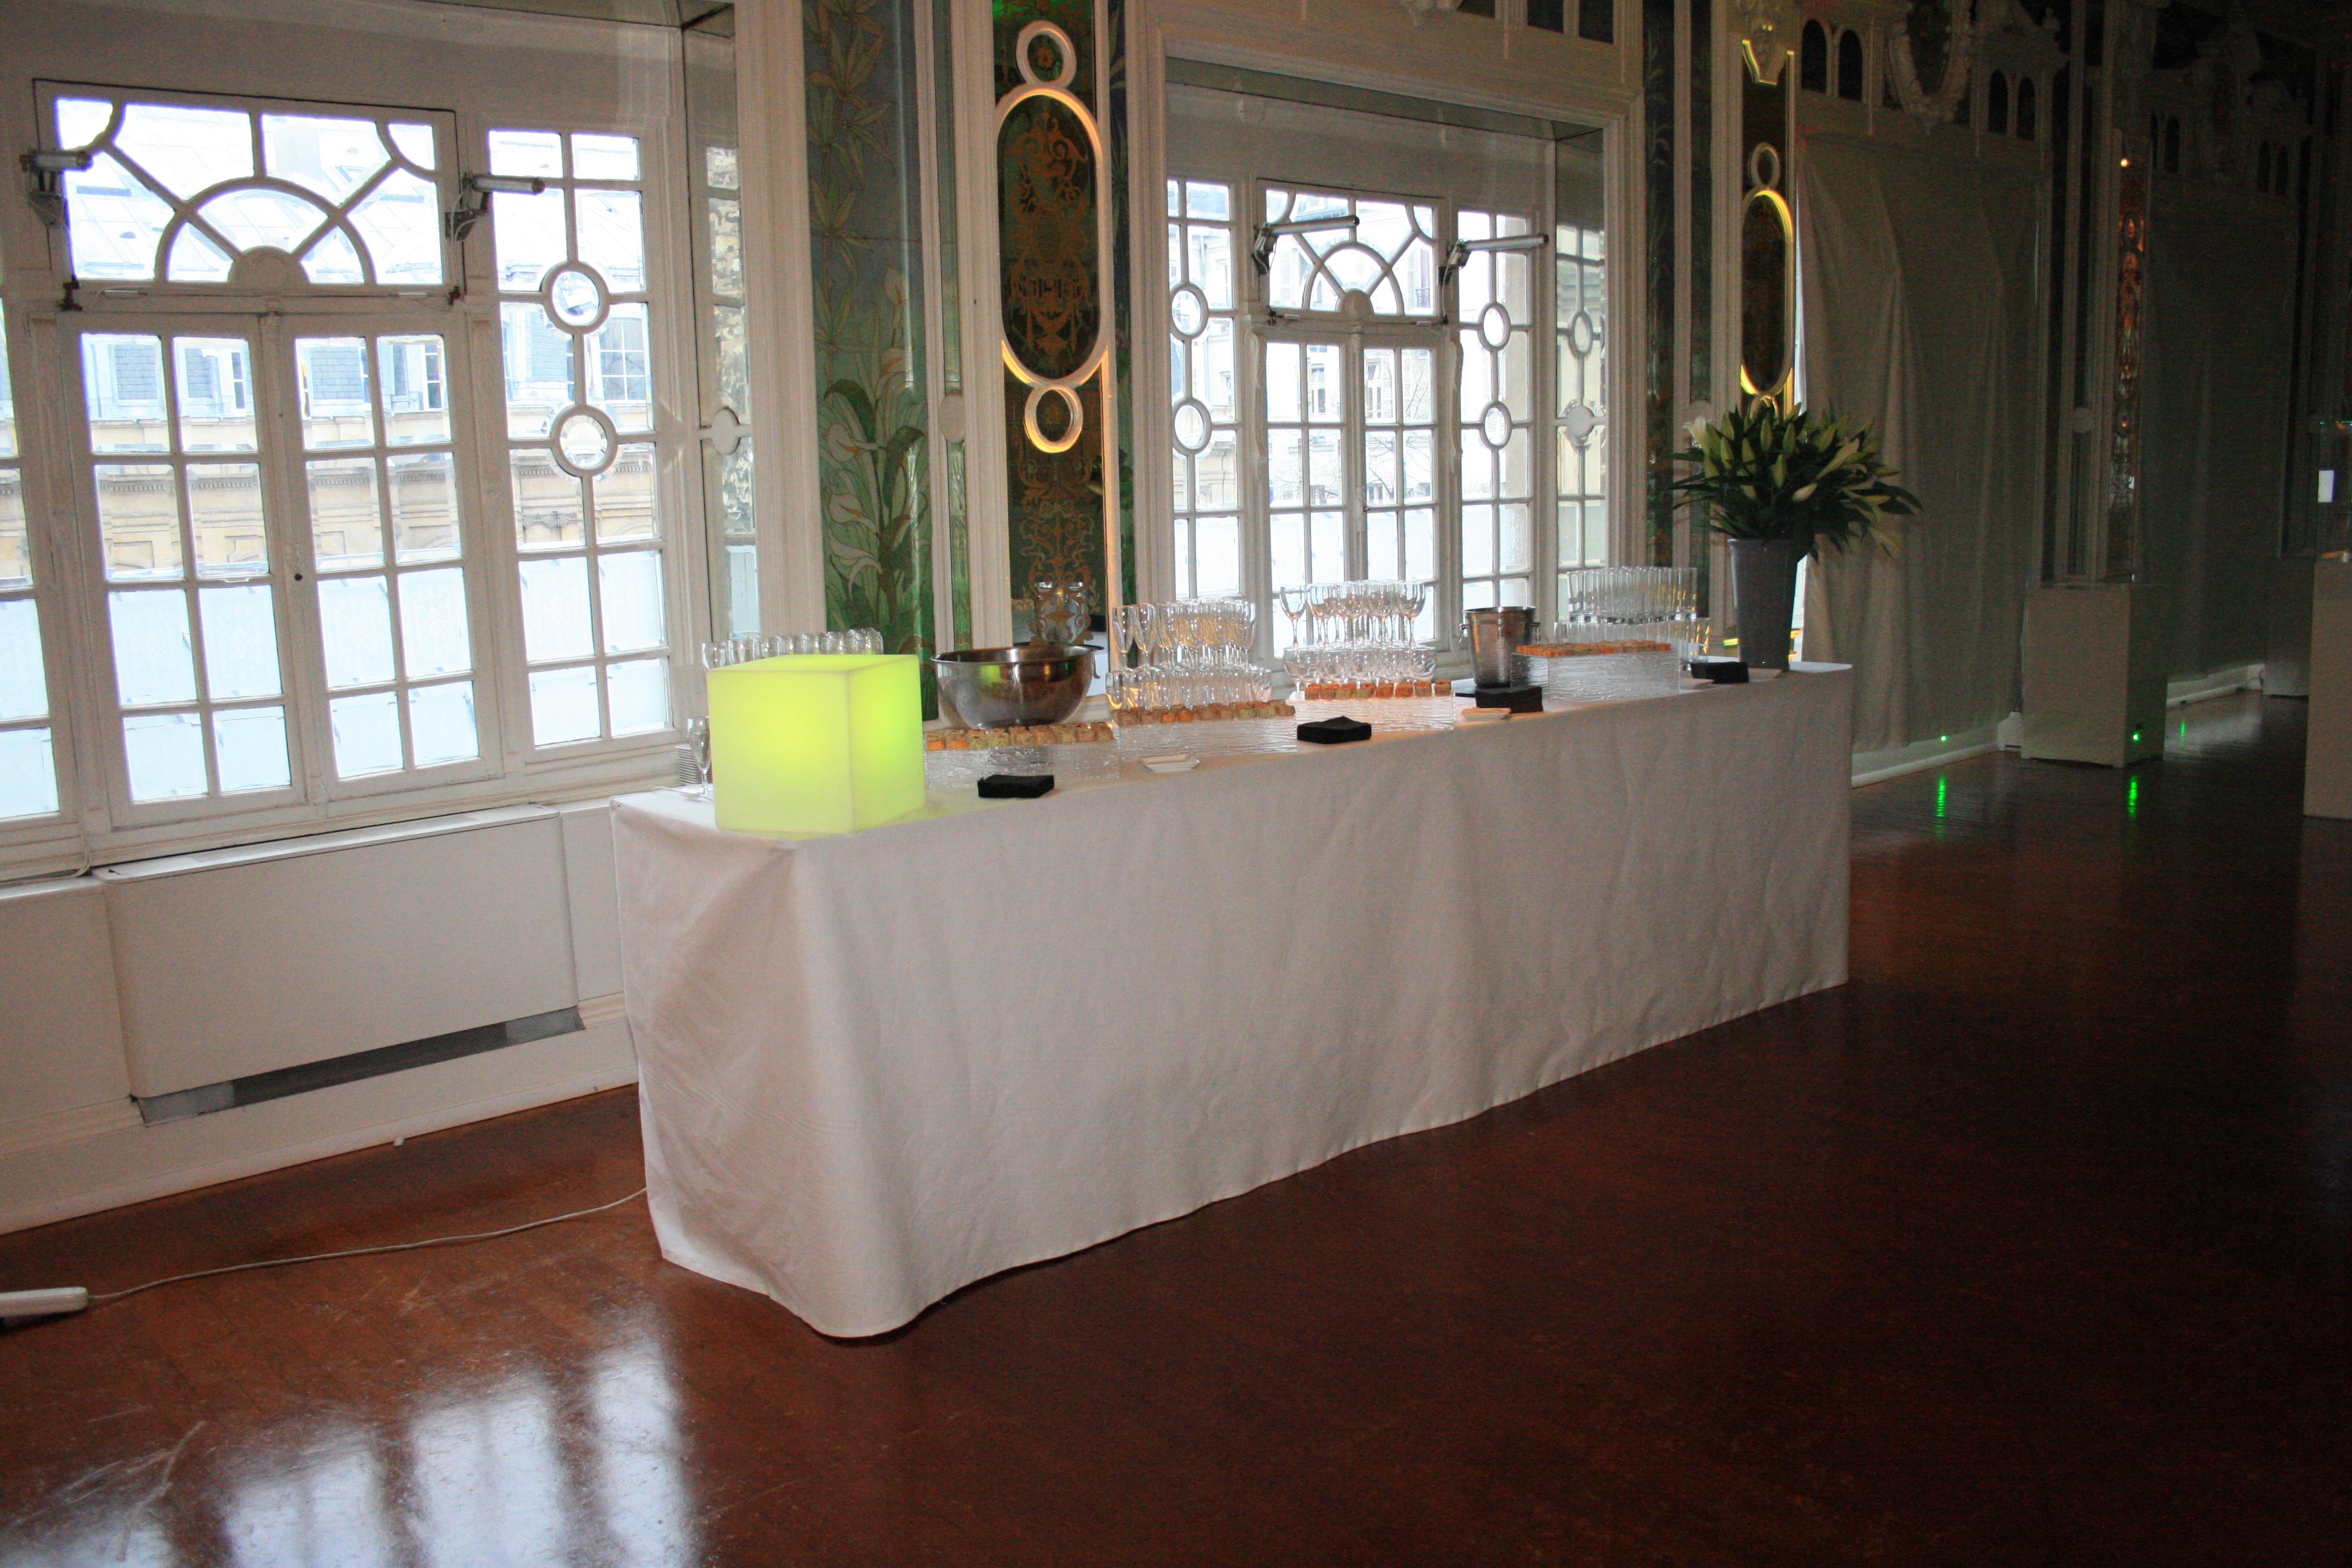 file le salon des miroirs buffet wikimedia commons. Black Bedroom Furniture Sets. Home Design Ideas